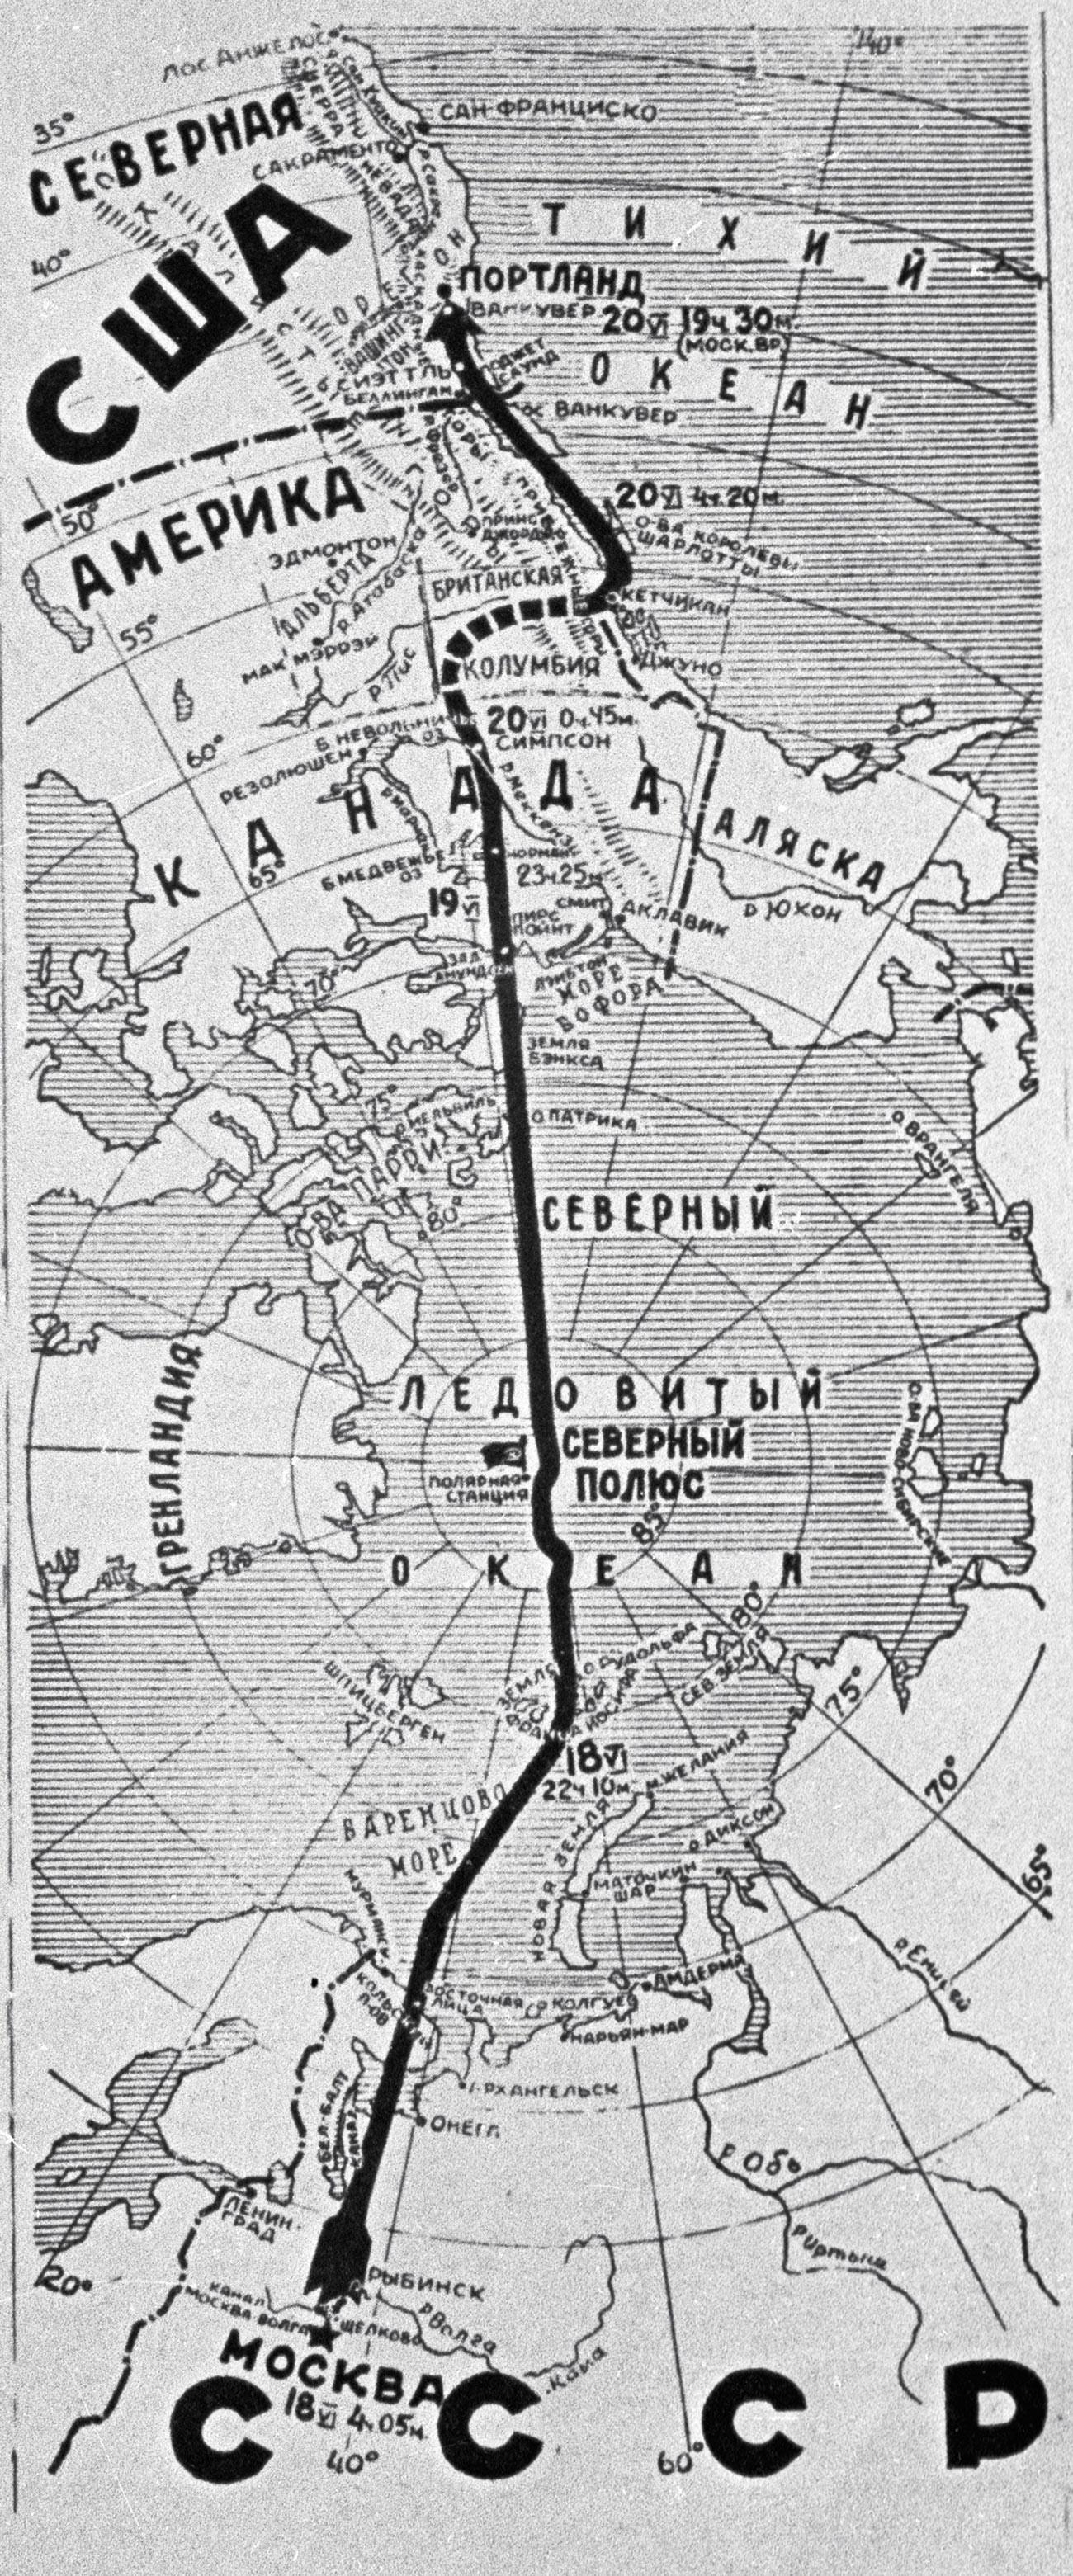 Chkalov menerbangkan pesawat dari Moskow ke Vancouver, Washington, AS, melalui Kutub Utara.